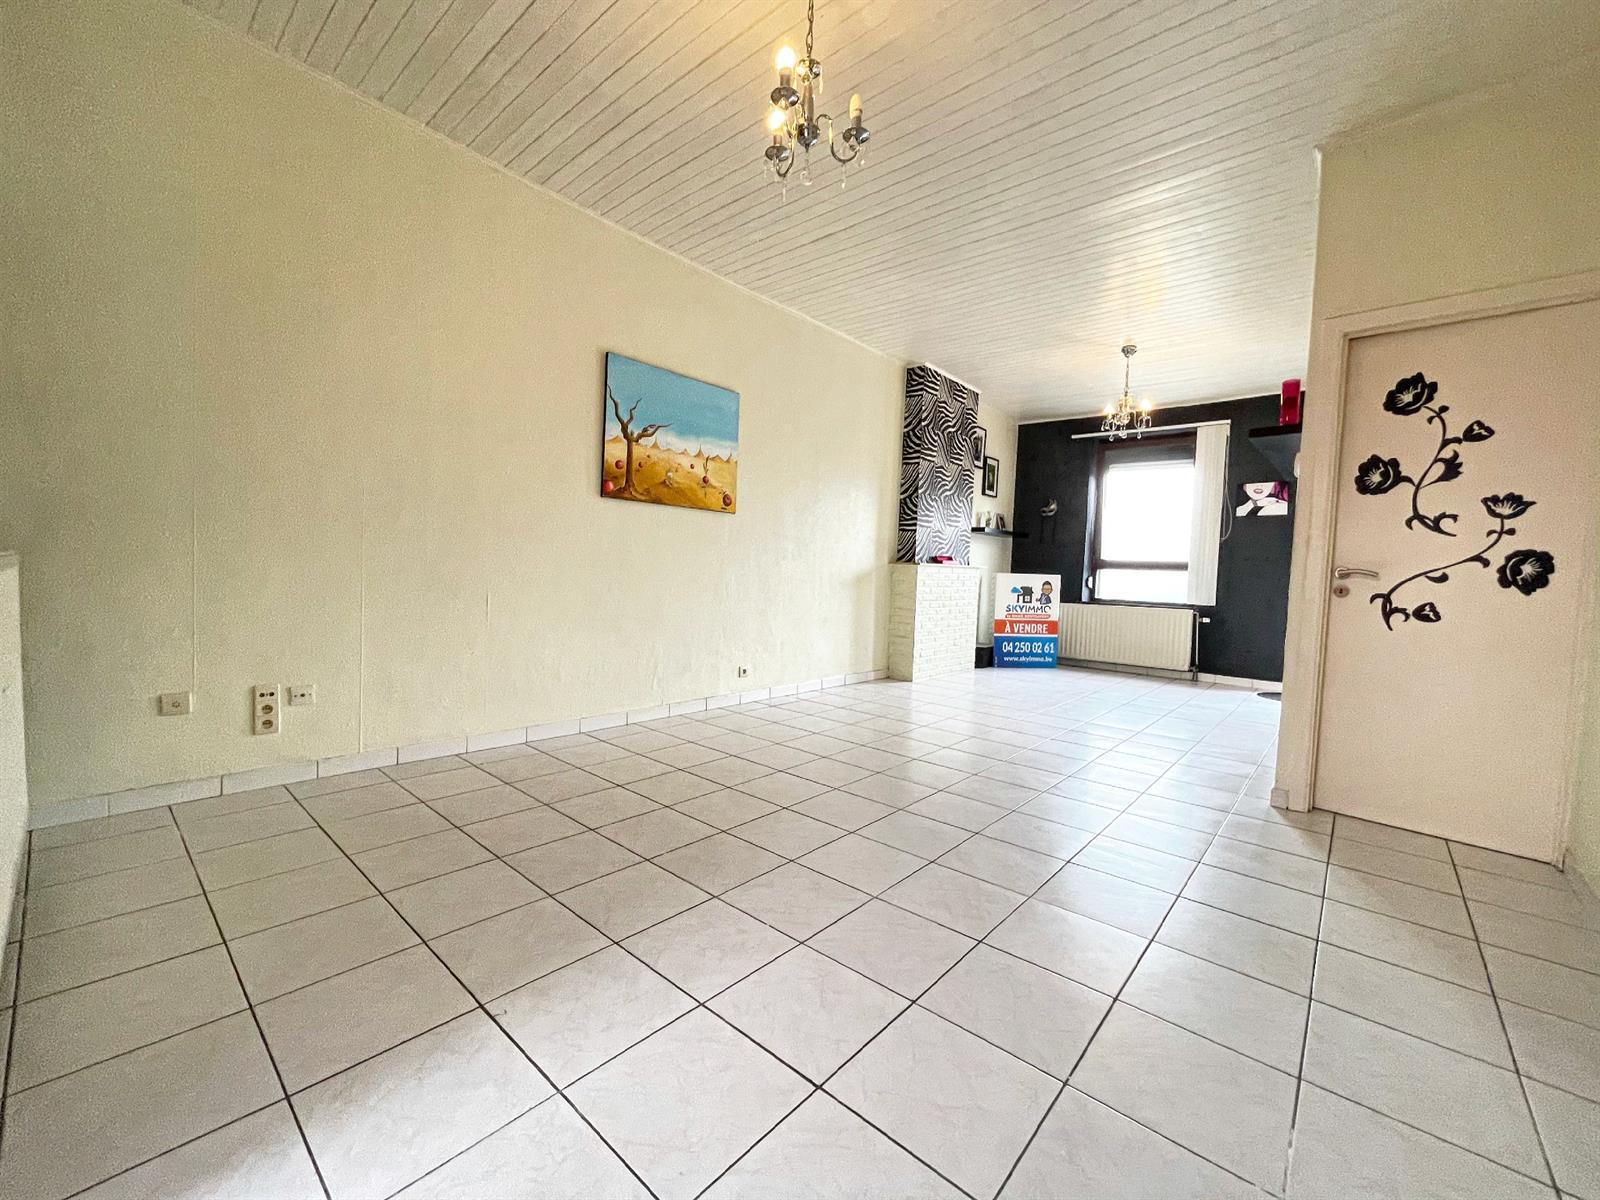 House - Liege - #4397857-4